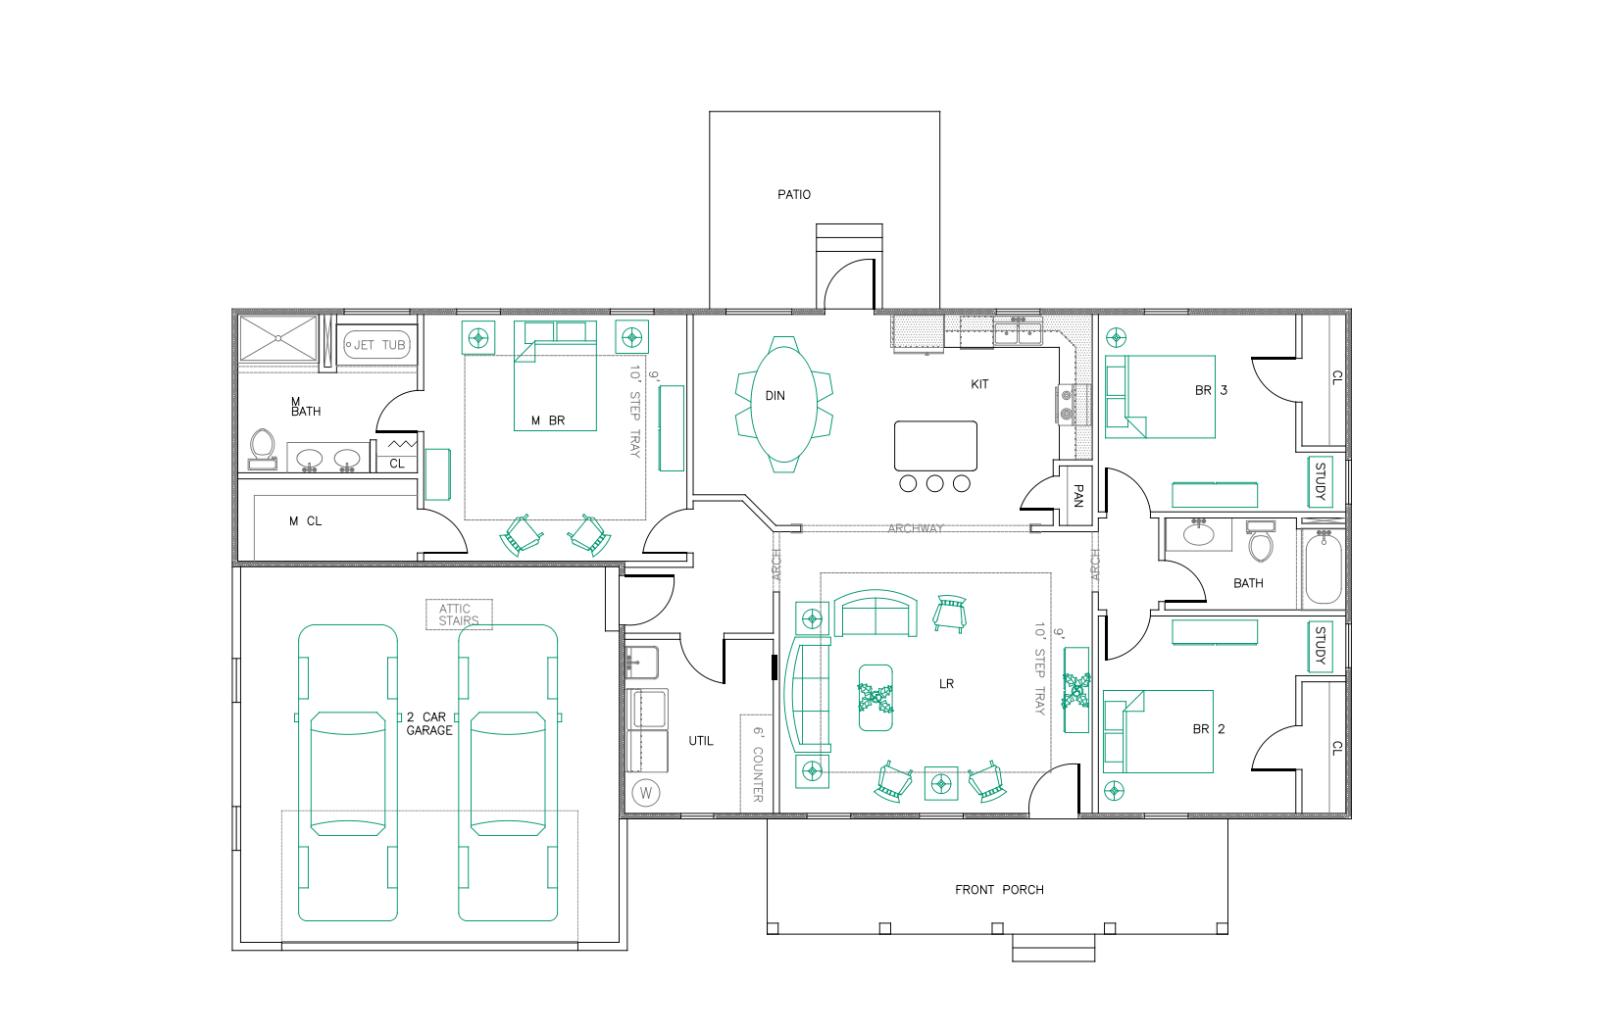 RANCH HOUSE PLANS 1747 SF 3 Bed 2 Bath Open Floor Split ...